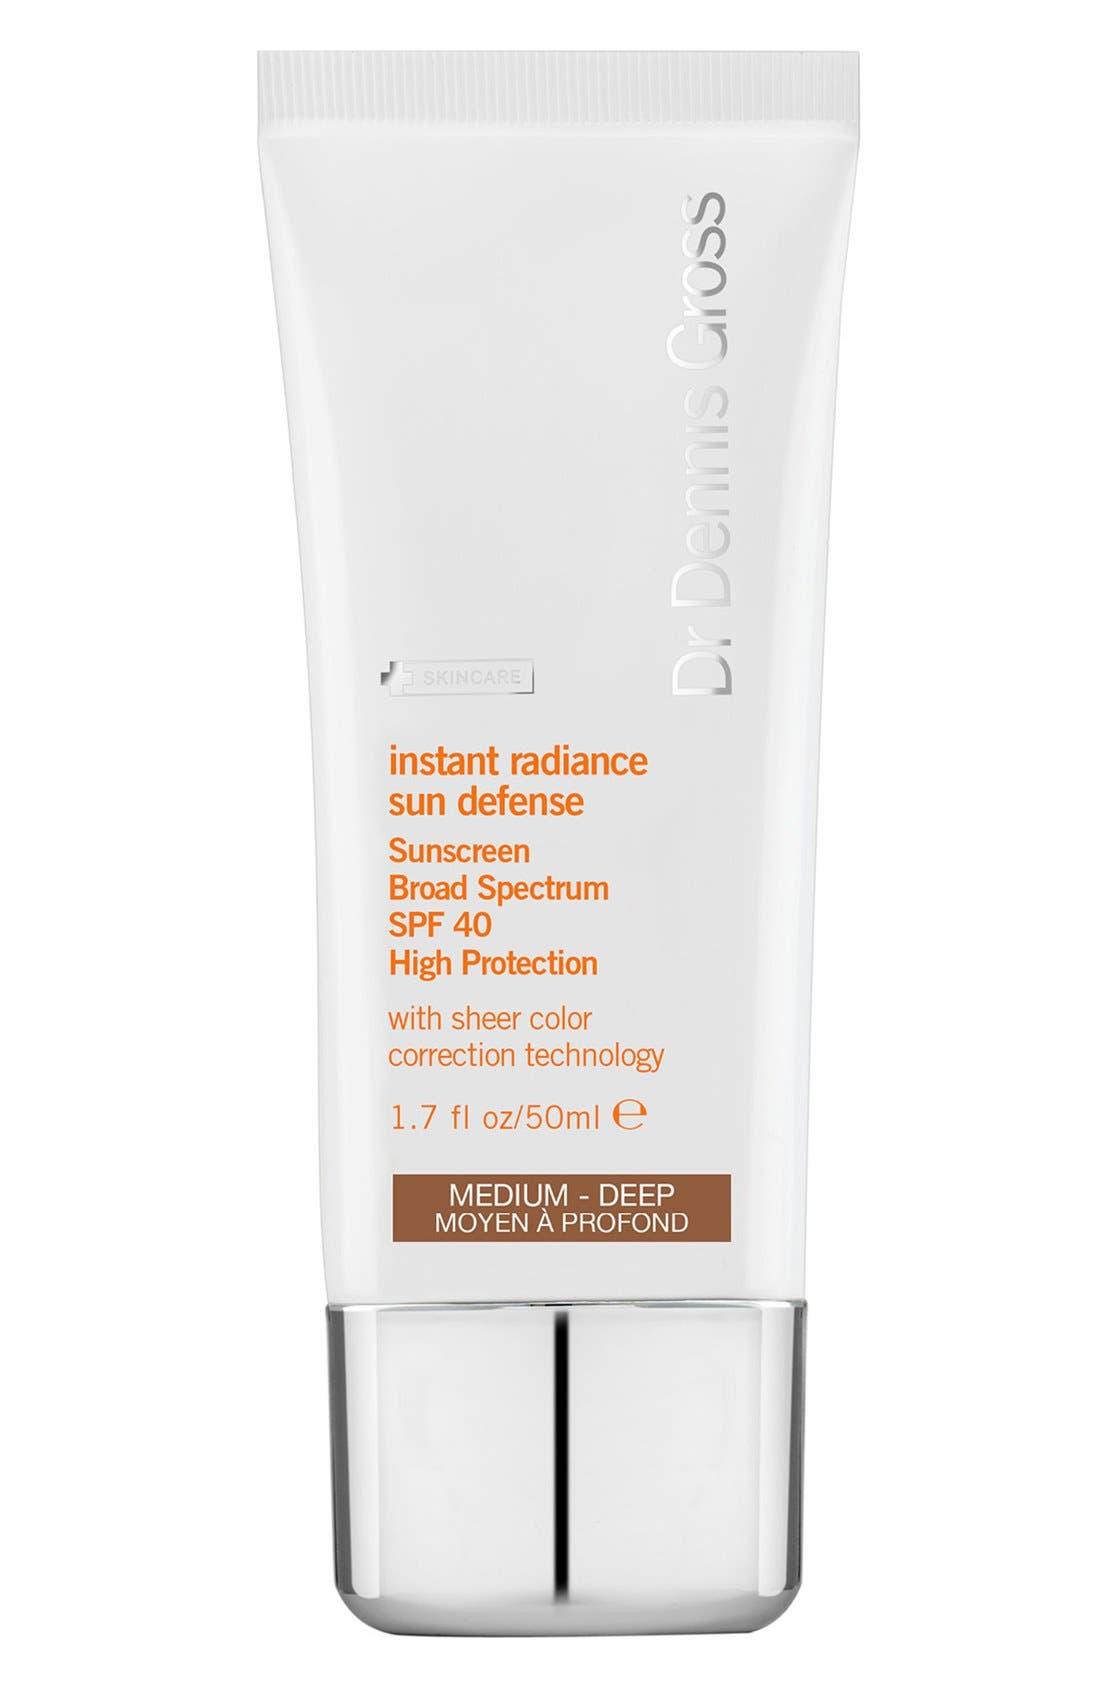 Instant Radiance Sun Defense Sunscreen Broad Spectrum Spf 40